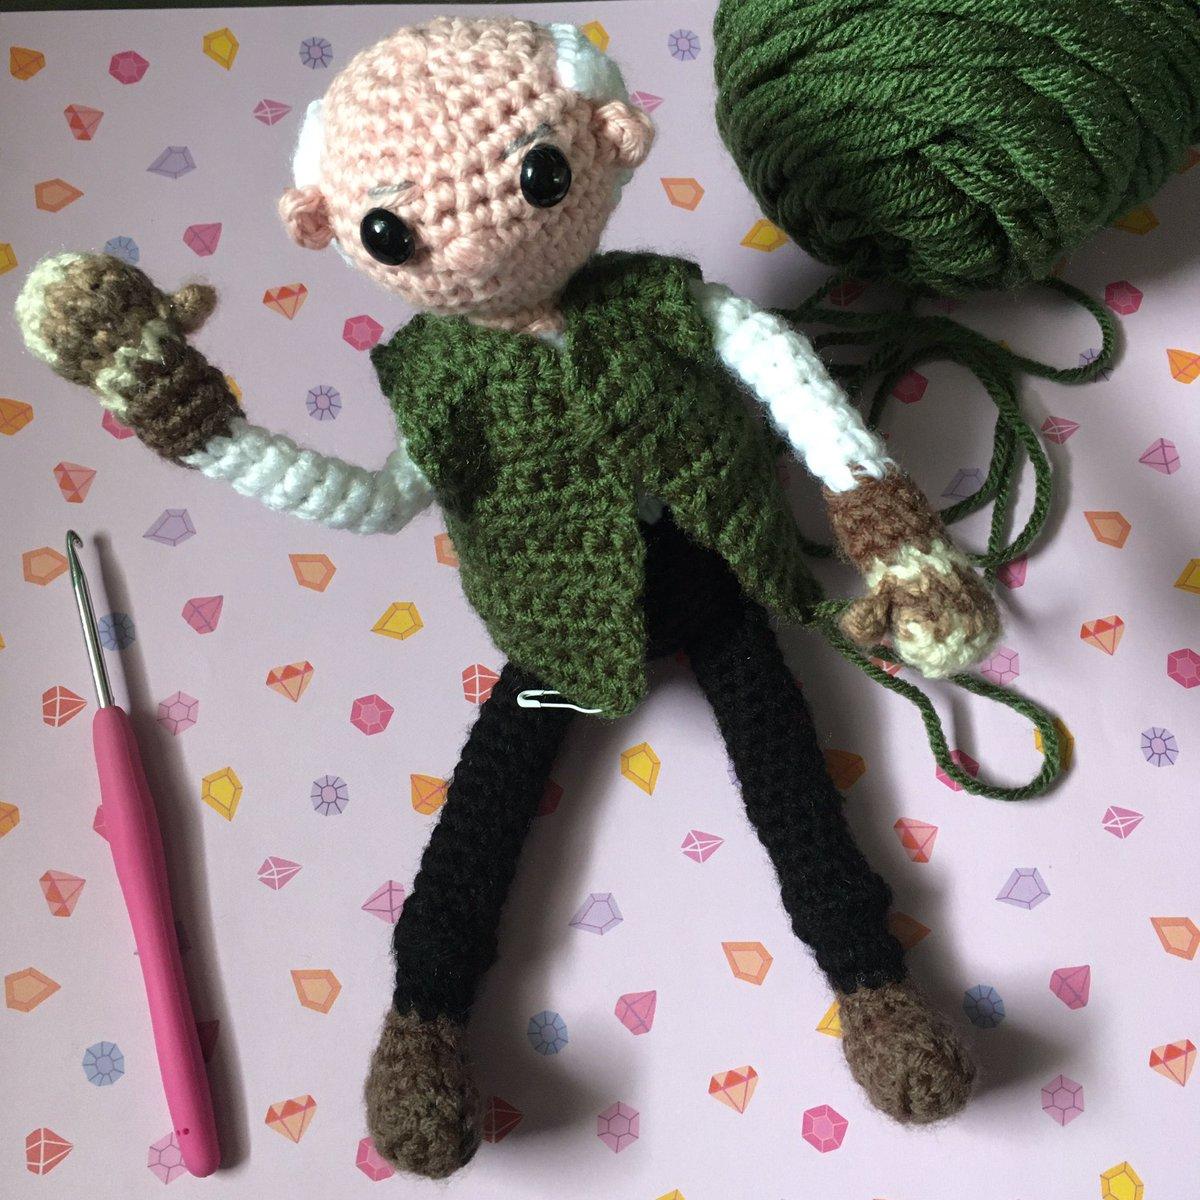 More progress on Bernie.  Pattern by: @tobeytimecrochet   #amigurumi #crochet #fiberartist #berniesanders #berniesmittens #craftglee